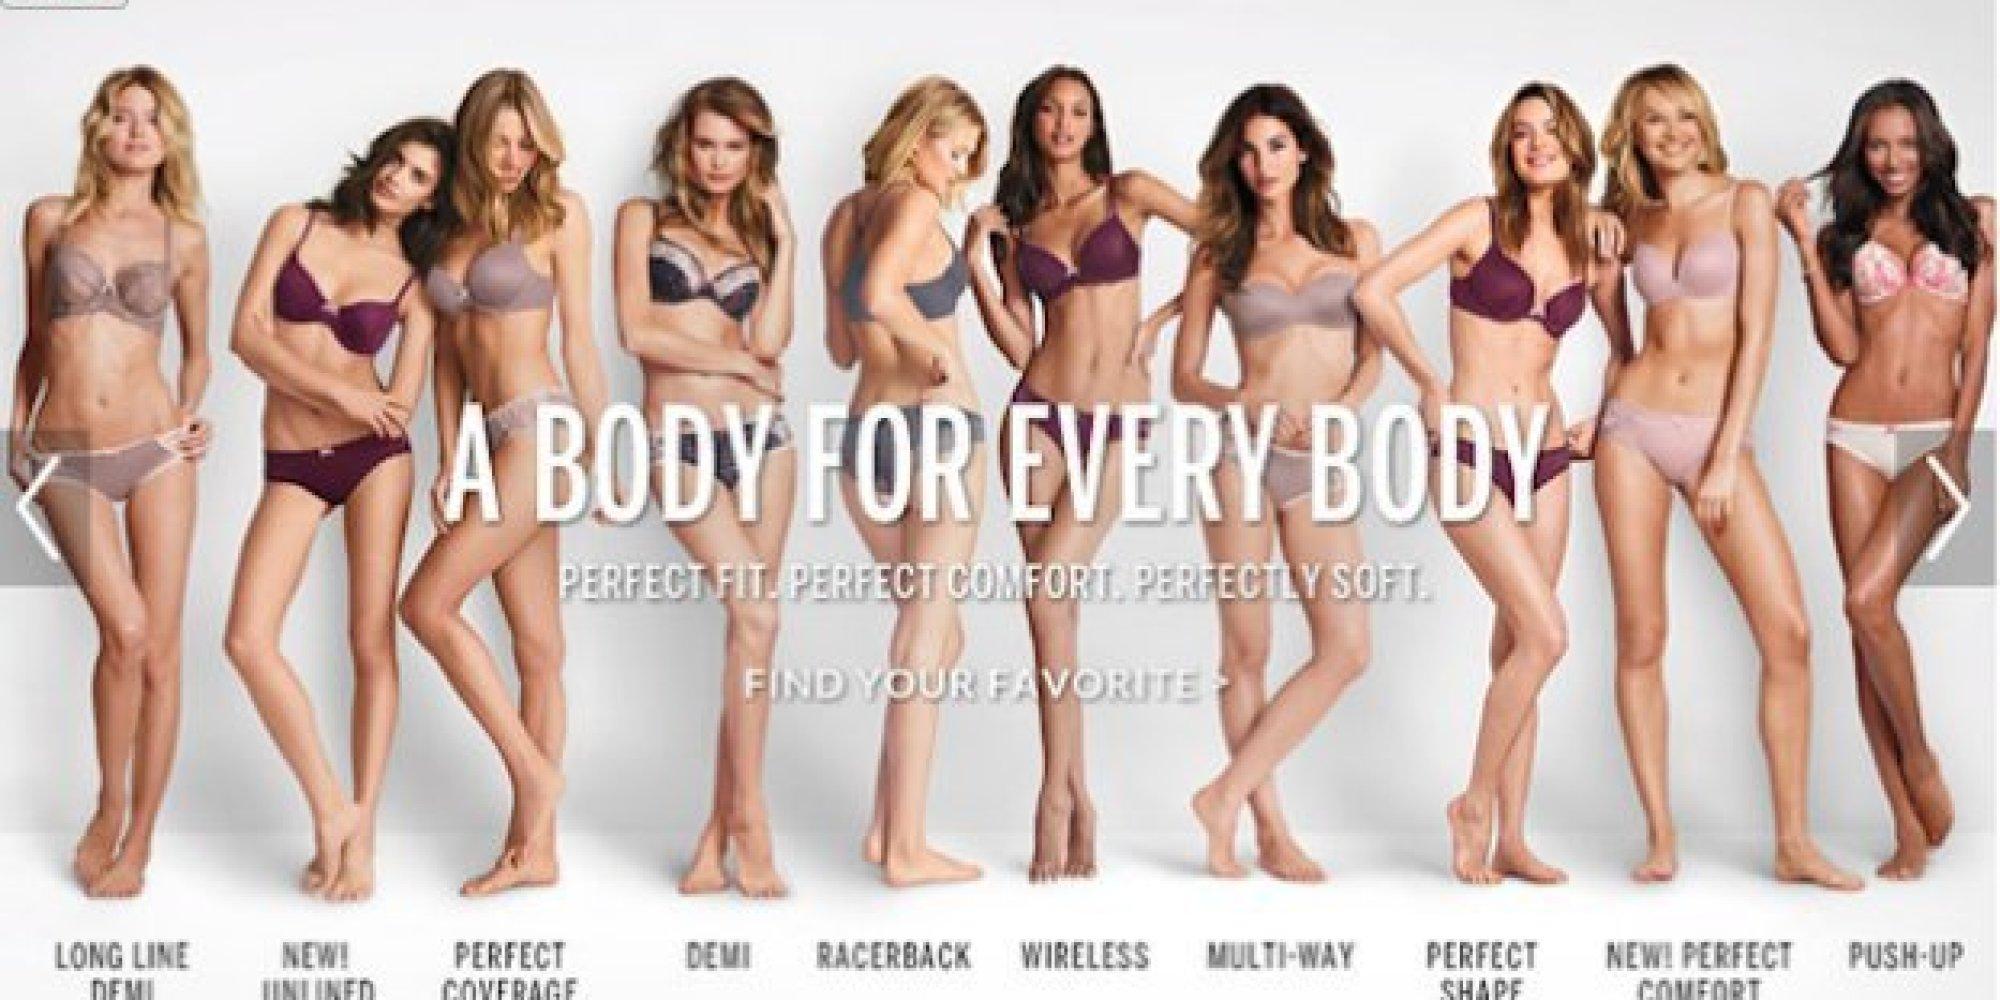 Victoria's Secret 'Perfect Body' Campaign Changes Slogan After ...